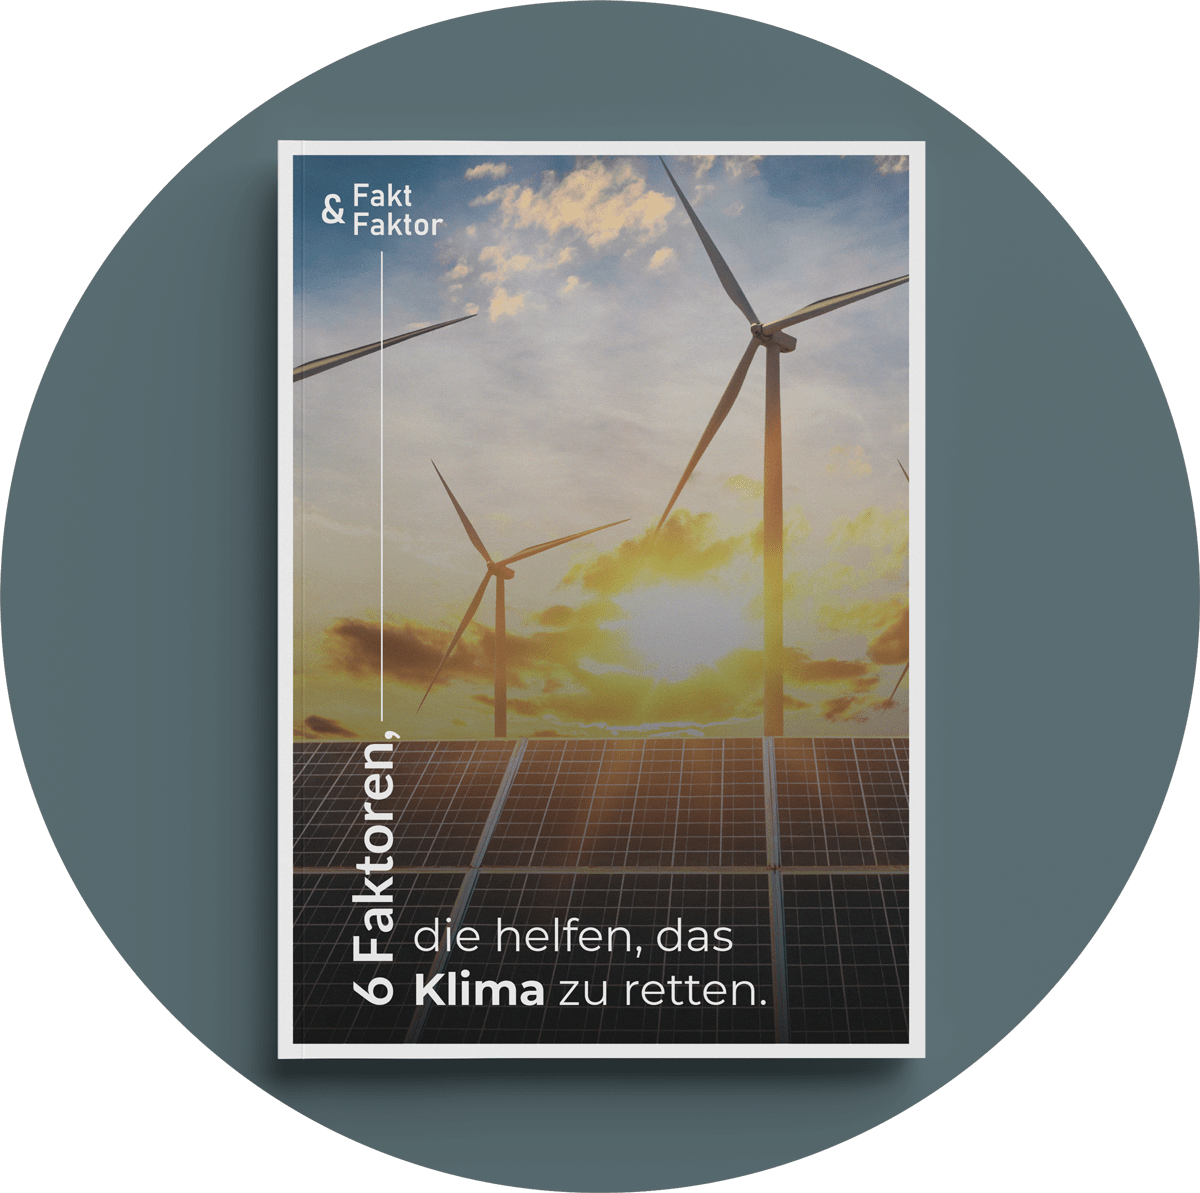 whitepaper 6 faktoren klima - fakt & faktor